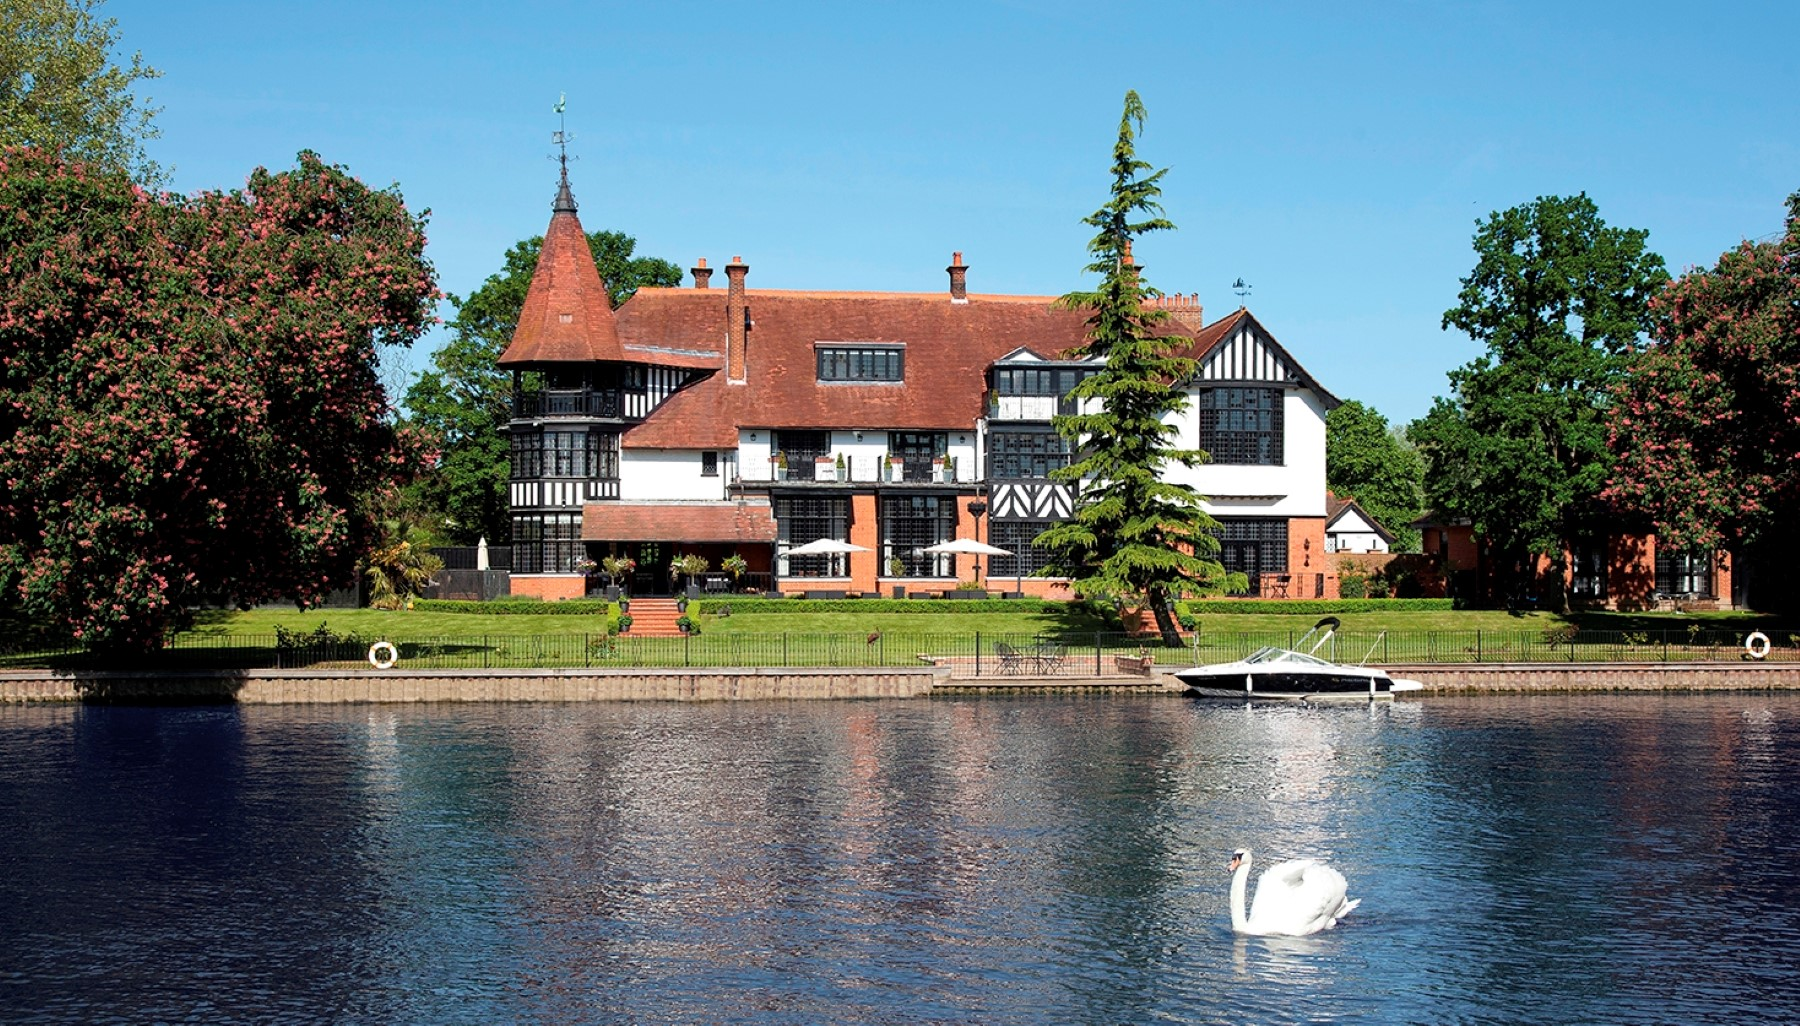 Casa para uma família para Venda às Bray Fishery Road Bray Other England, Inglaterra SL61UN Reino Unido